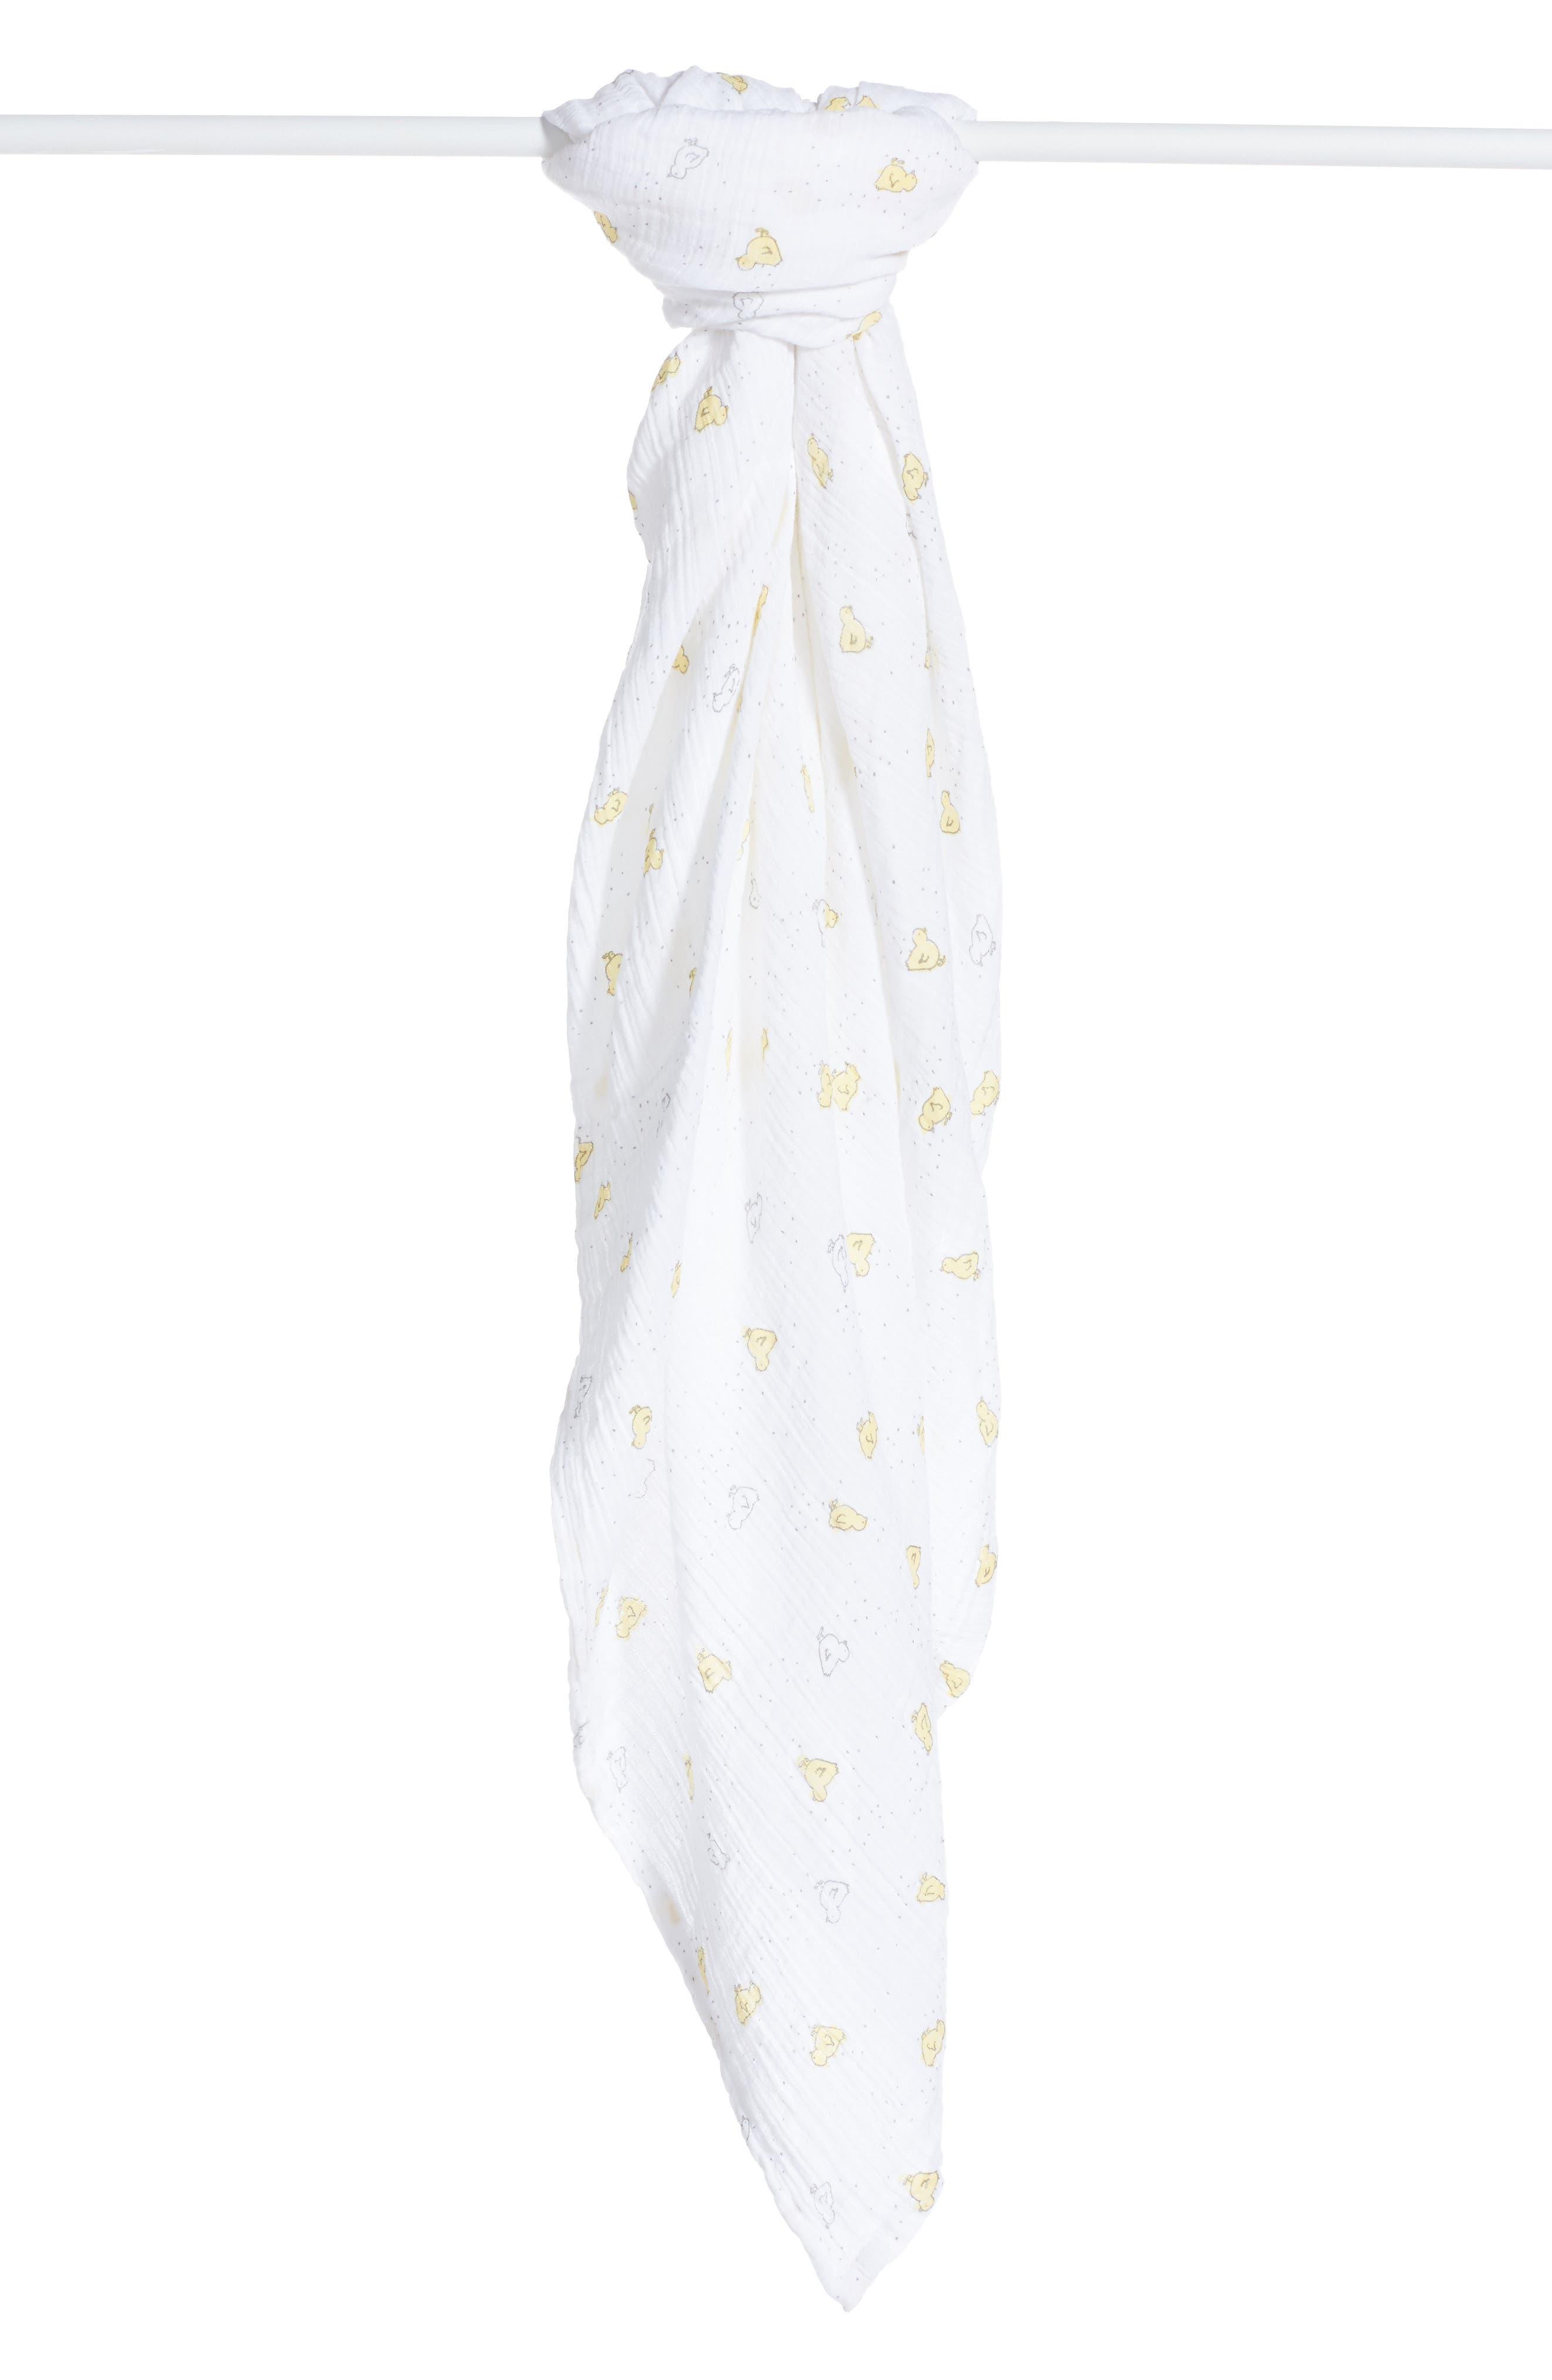 Chick Swaddle Blanket Set,                             Alternate thumbnail 2, color,                             Cream